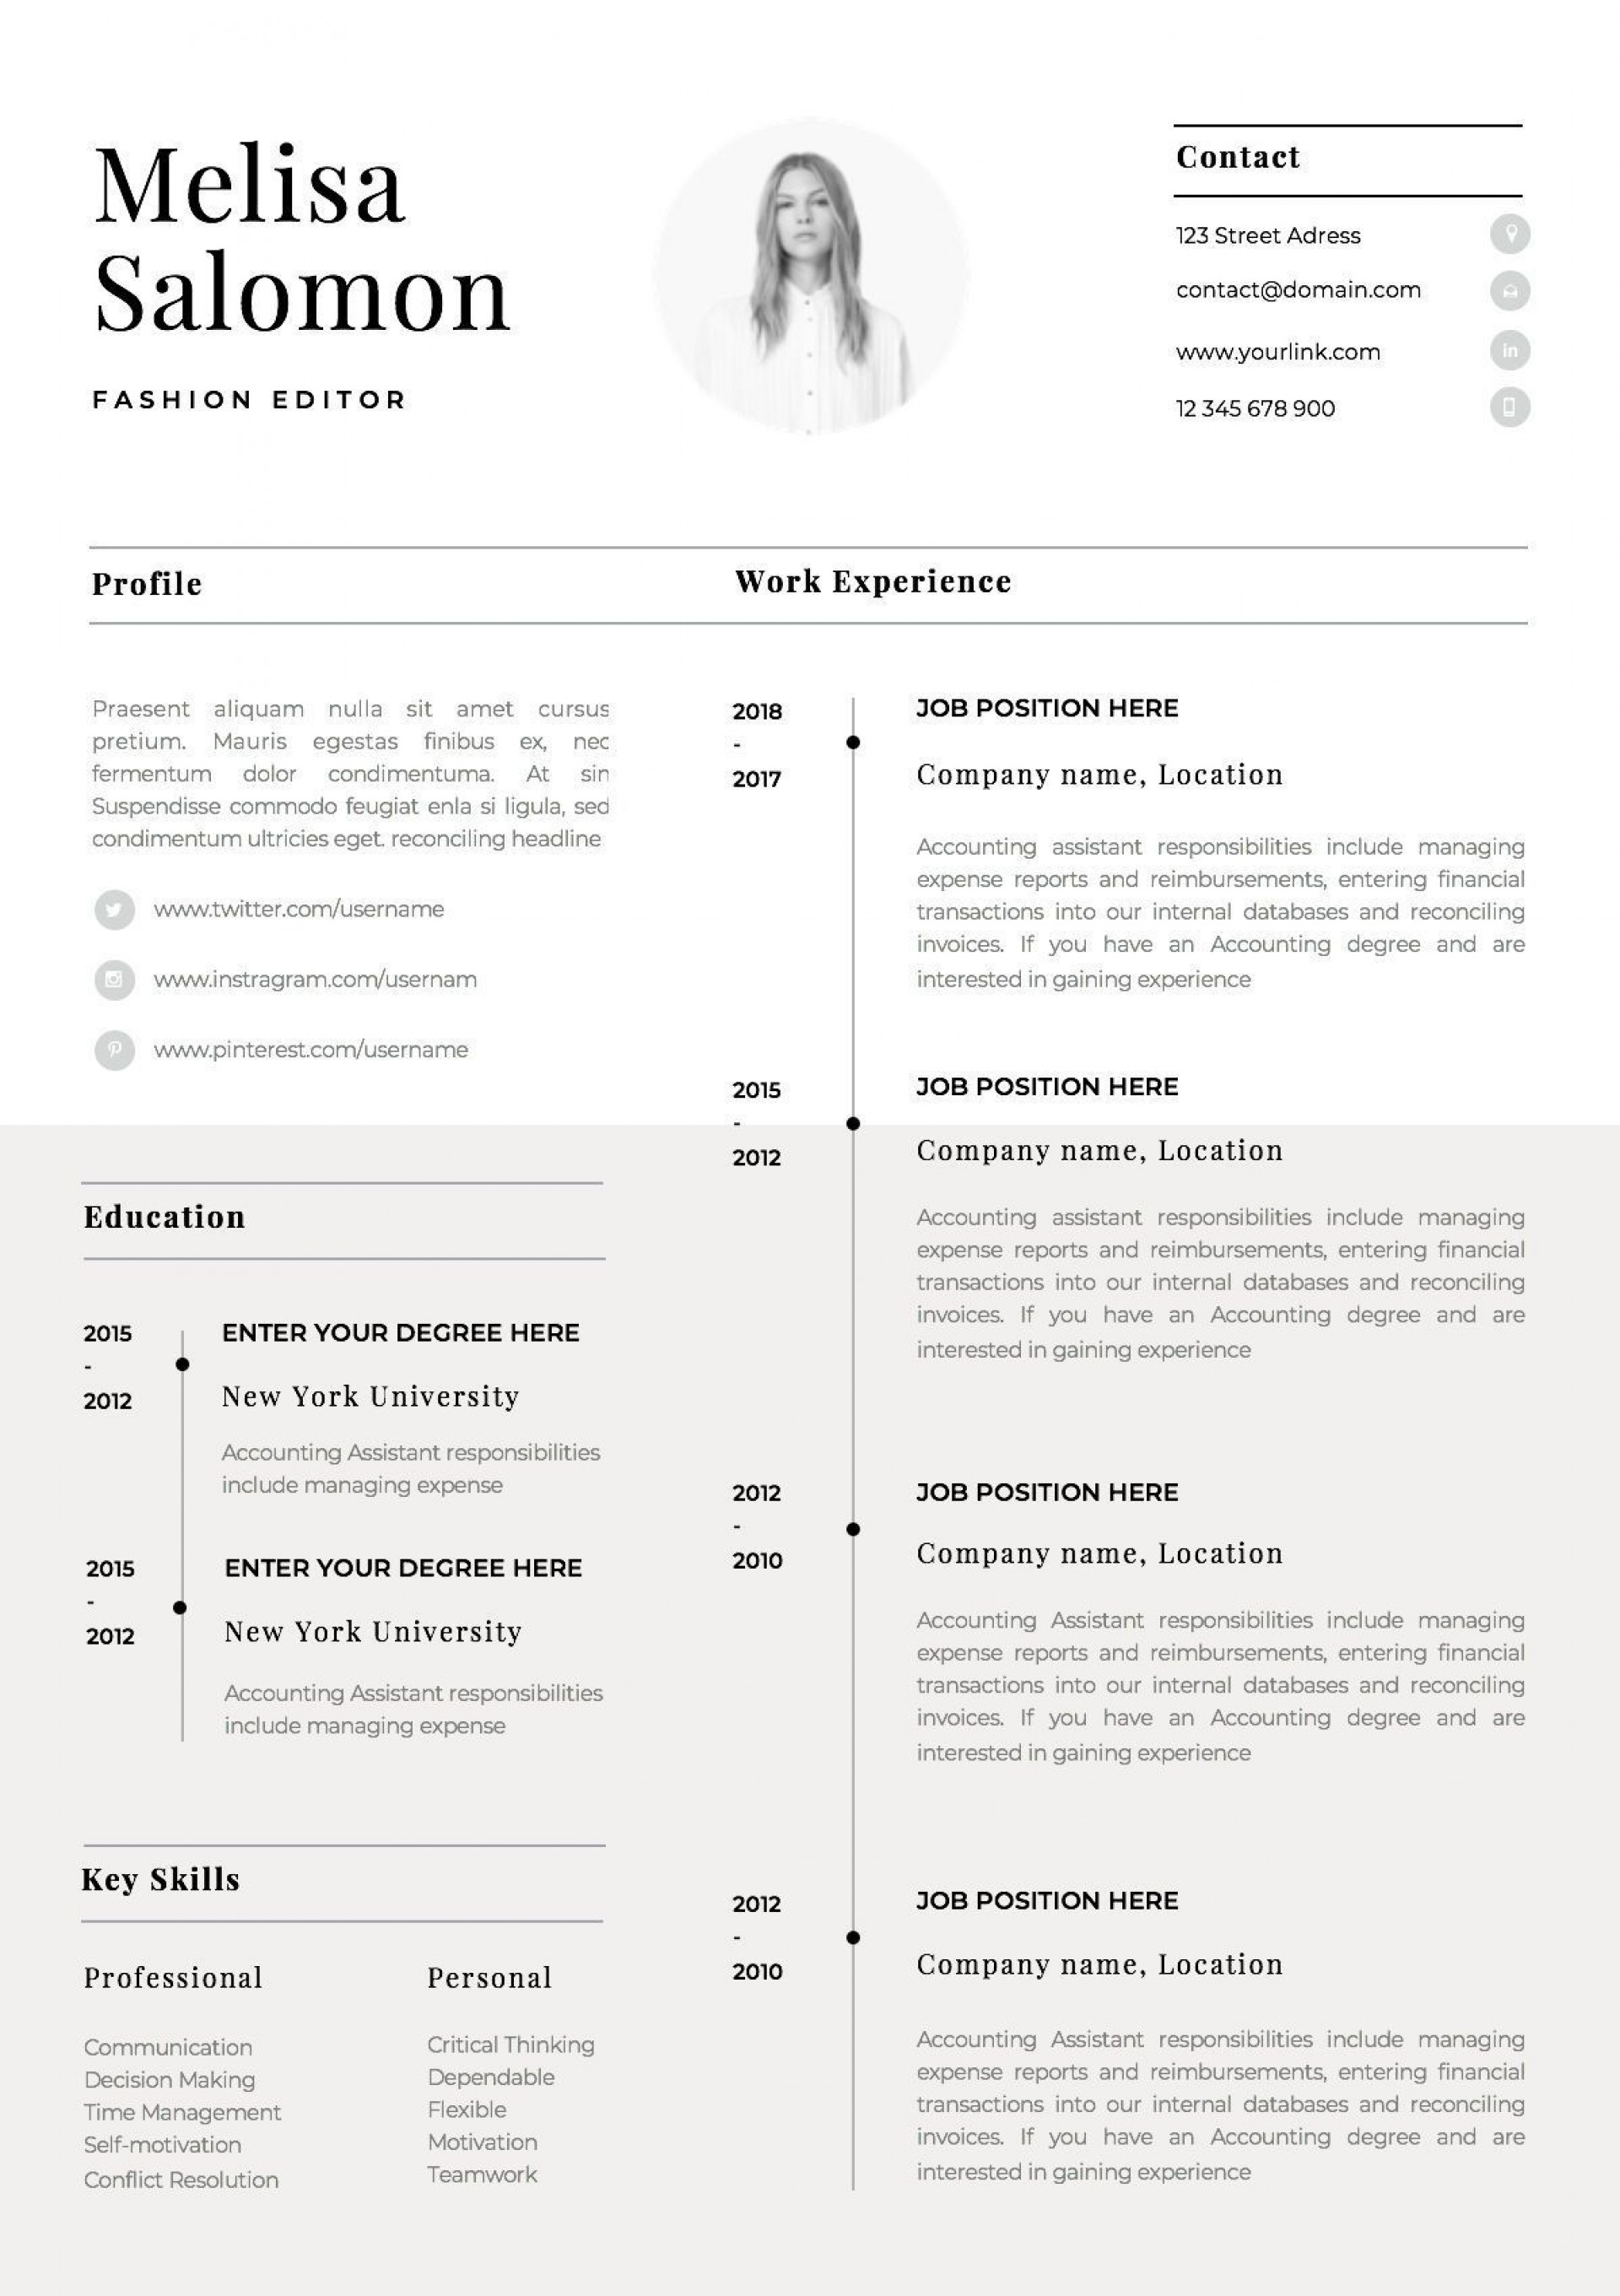 001 Impressive One Page Resume Template Idea  Templates Microsoft Word Free1920